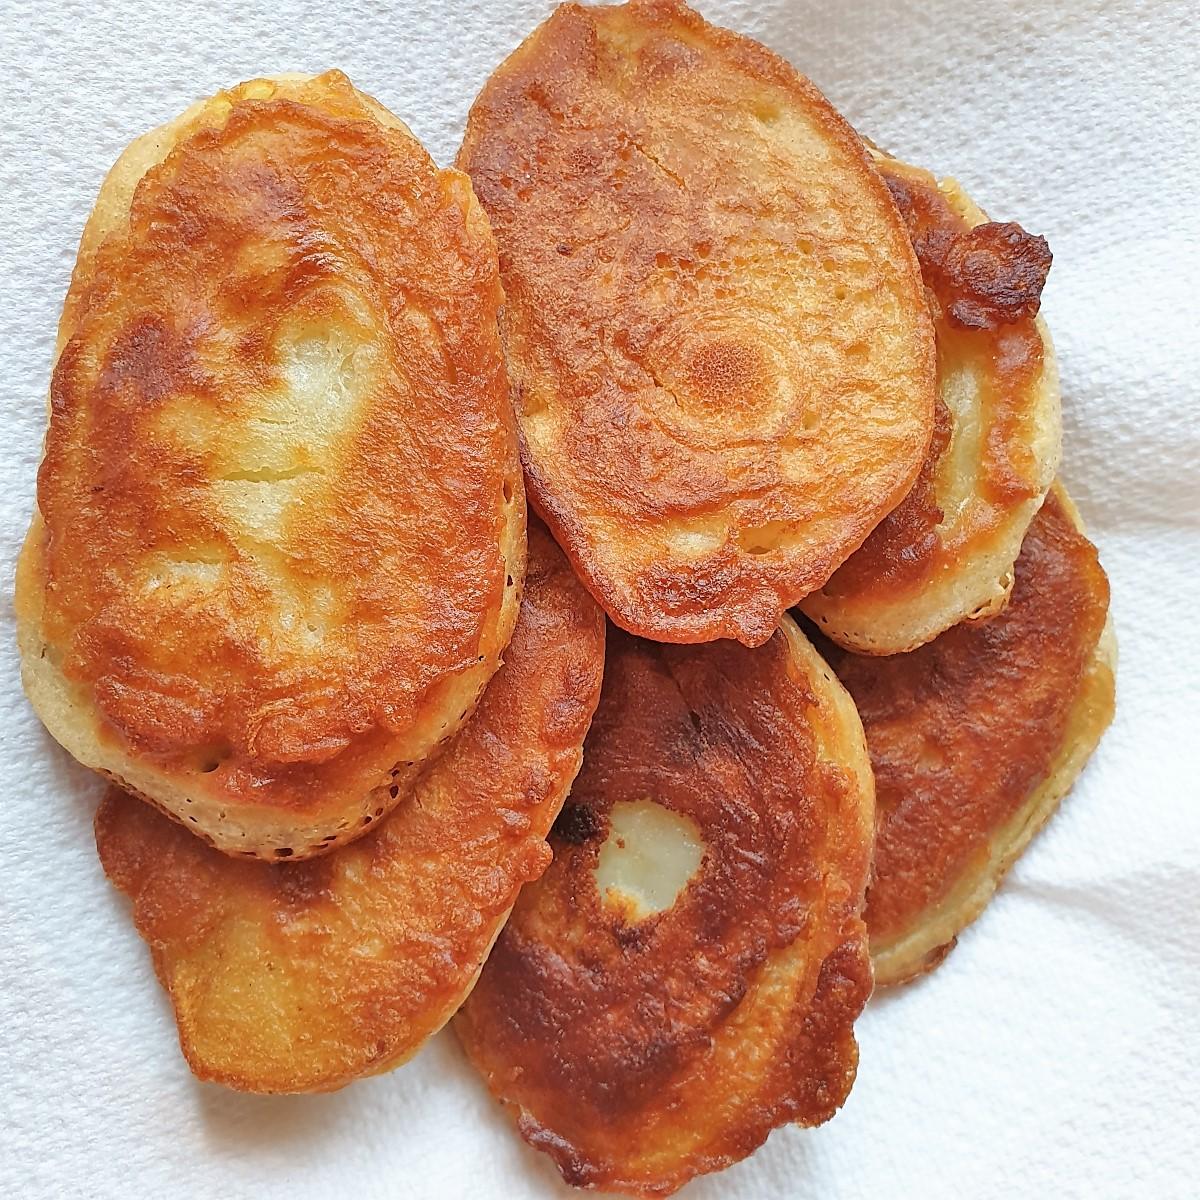 A dish of fried scalloped potatoes.